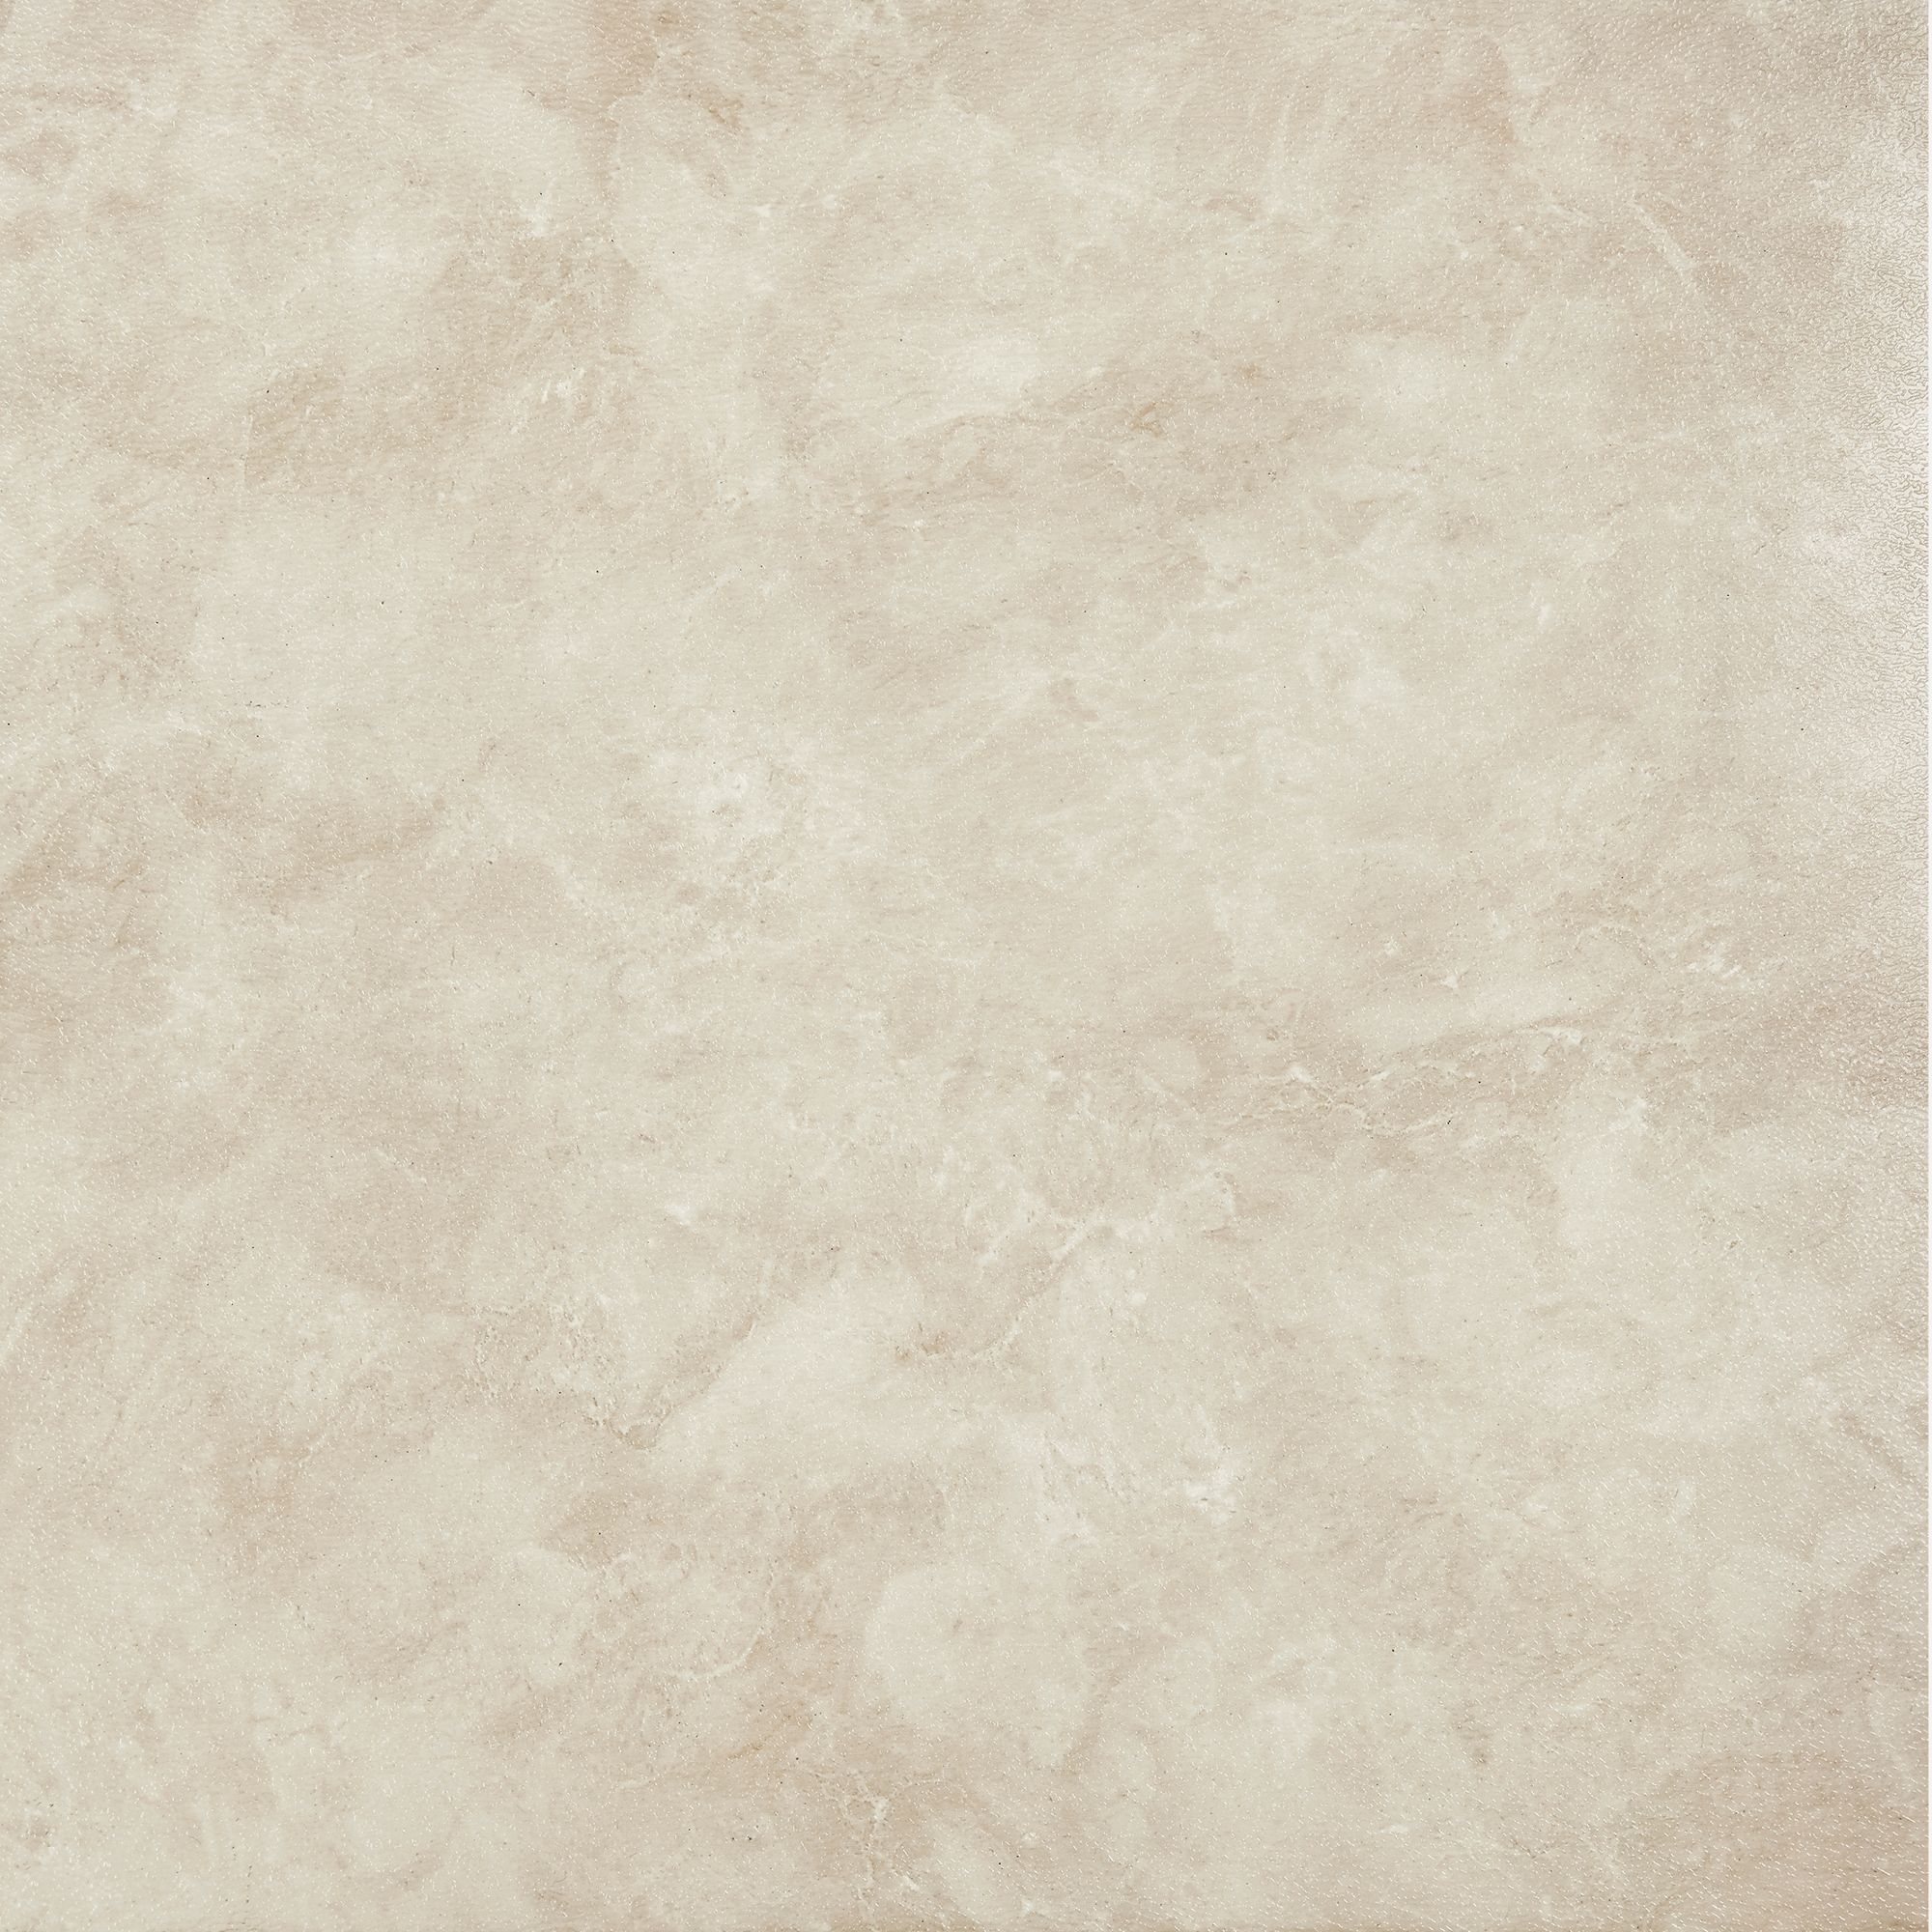 Achim Tivoli Carrera Marble 12x12 Self Adhesive Vinyl Floor Tile - 45 Tiles/45 sq. ft.